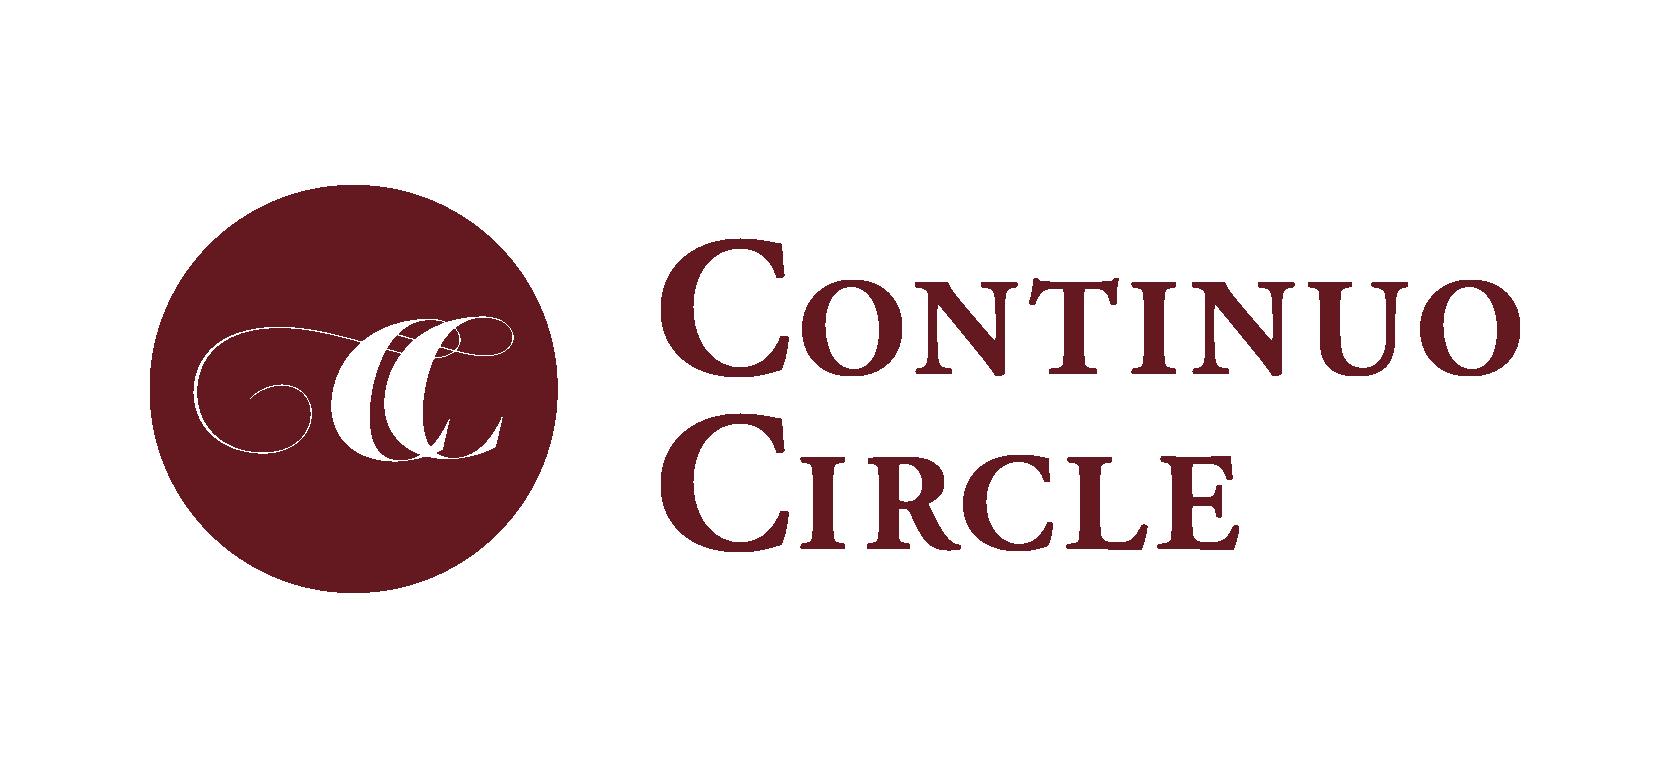 BS&F_Continuo-Circle_LOGO2_Crop.png